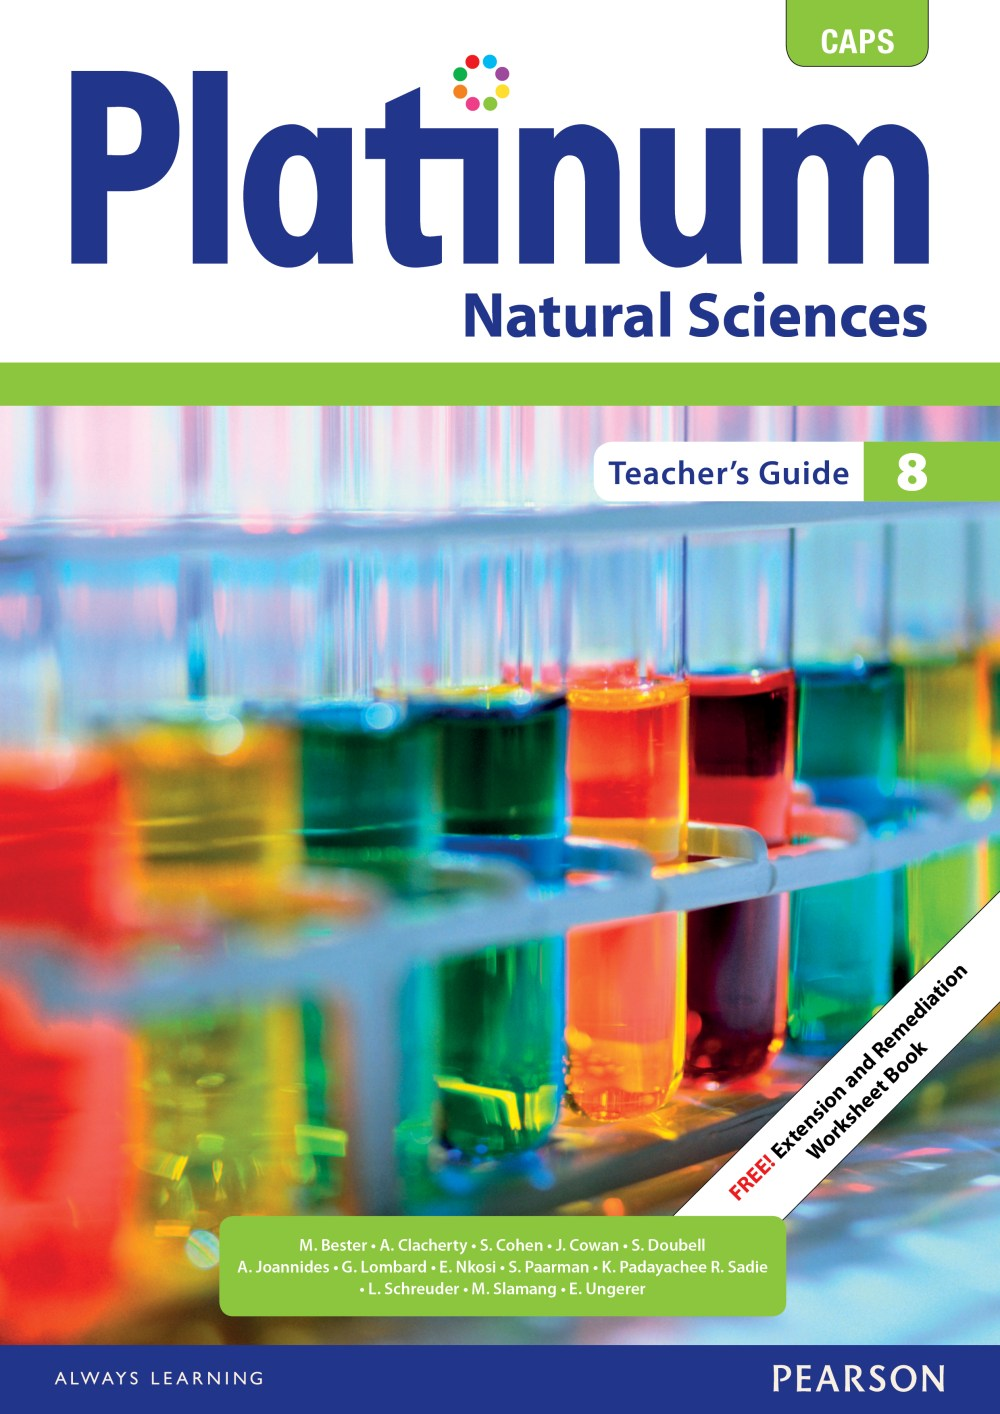 medium resolution of Platinum Natural Sciences Grade 8 Teacher's Guide ePDF (perpetual licence)    WCED ePortal